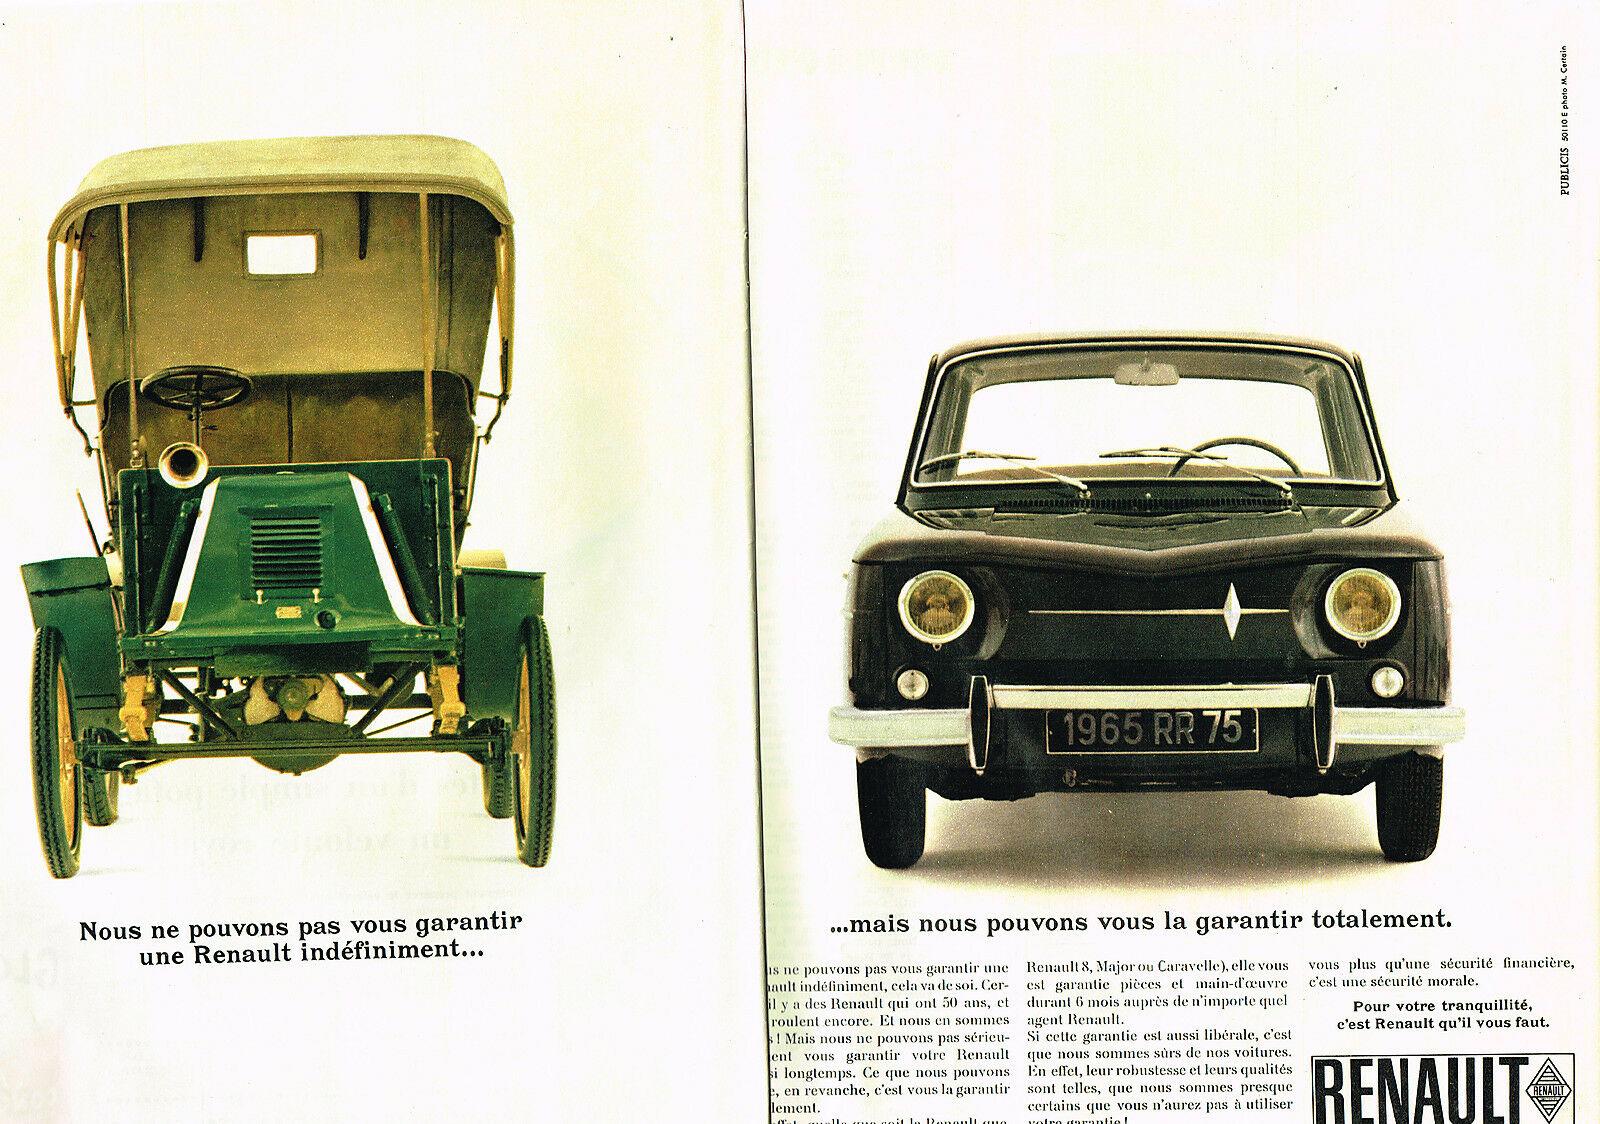 1968 Renault